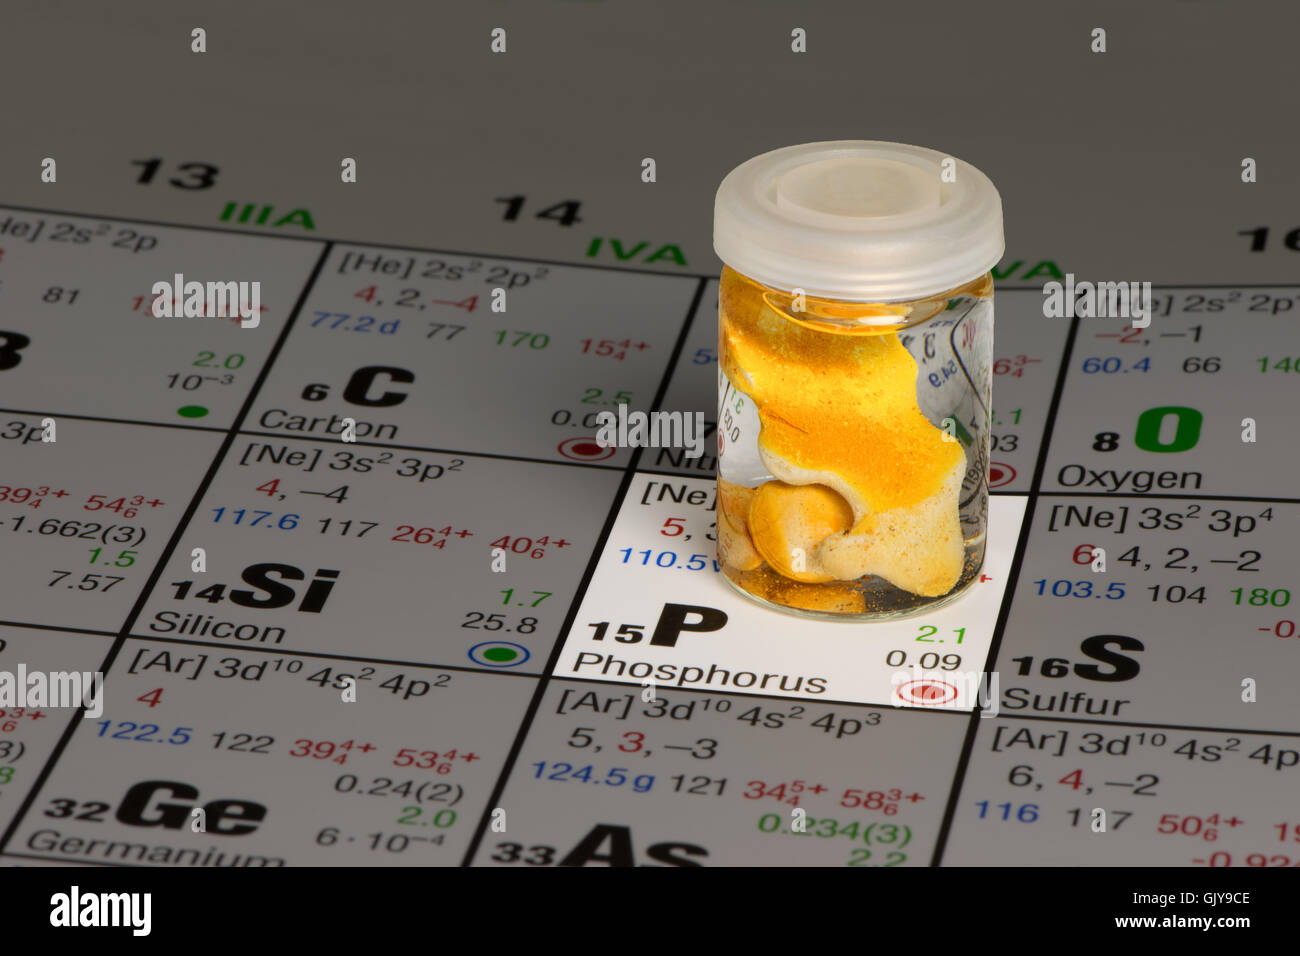 phosphorus on periodic table of elements - Stock Image